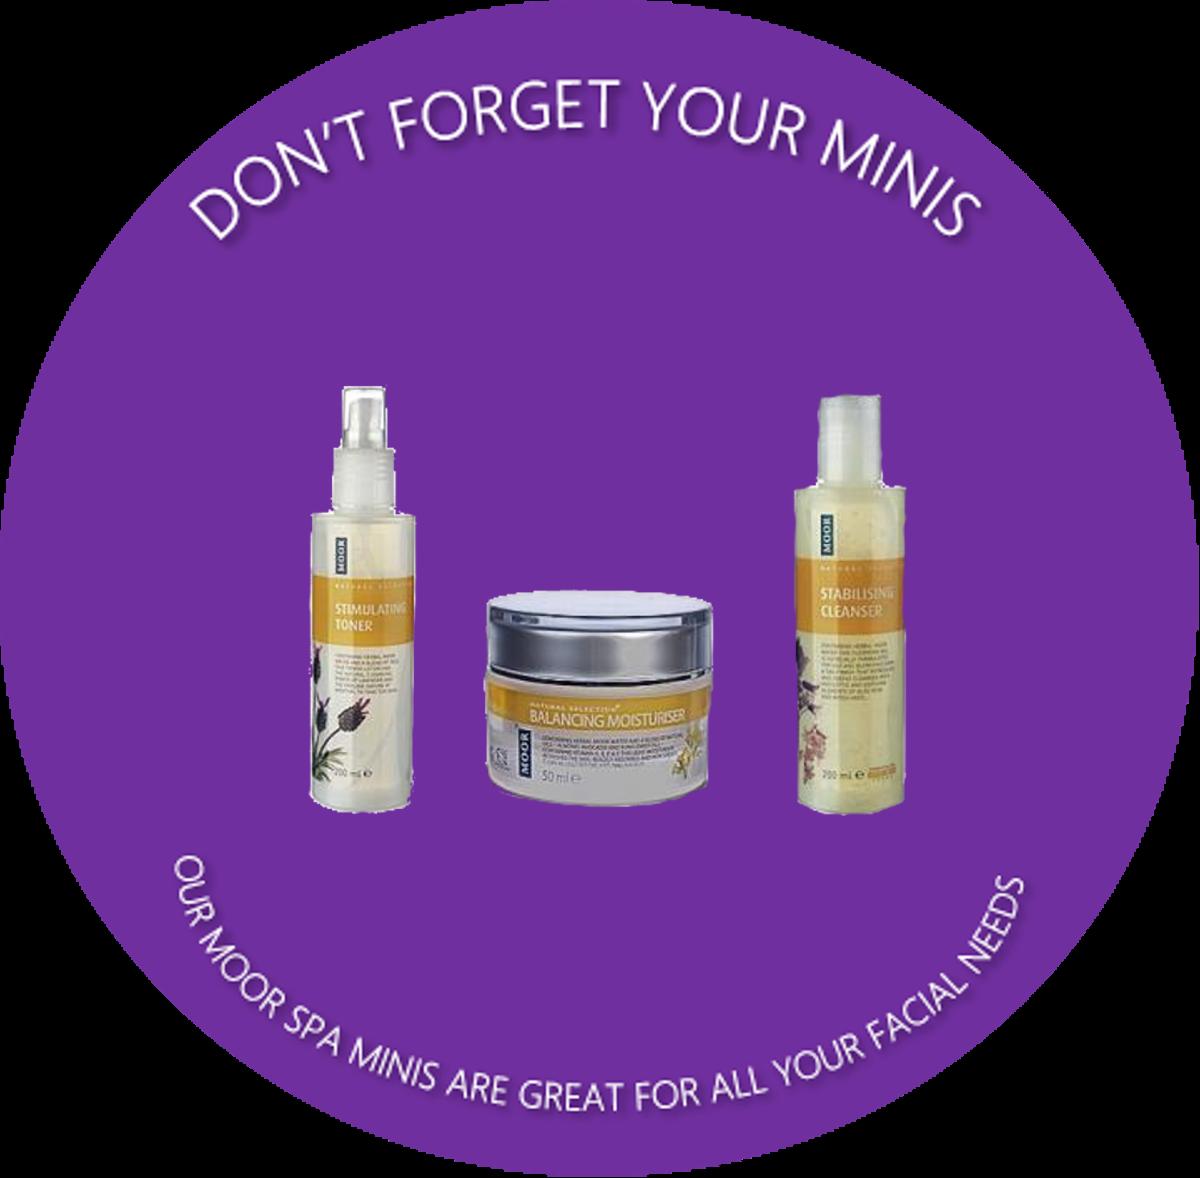 Venus-Beauty-Hair-Tavistock-Devon-Salon-Summer-Holiday-Prep-Hair-Stylist-Beauty-Therapist-Top-Holiday-Product-Minis-Moor-Spa-Facials.png